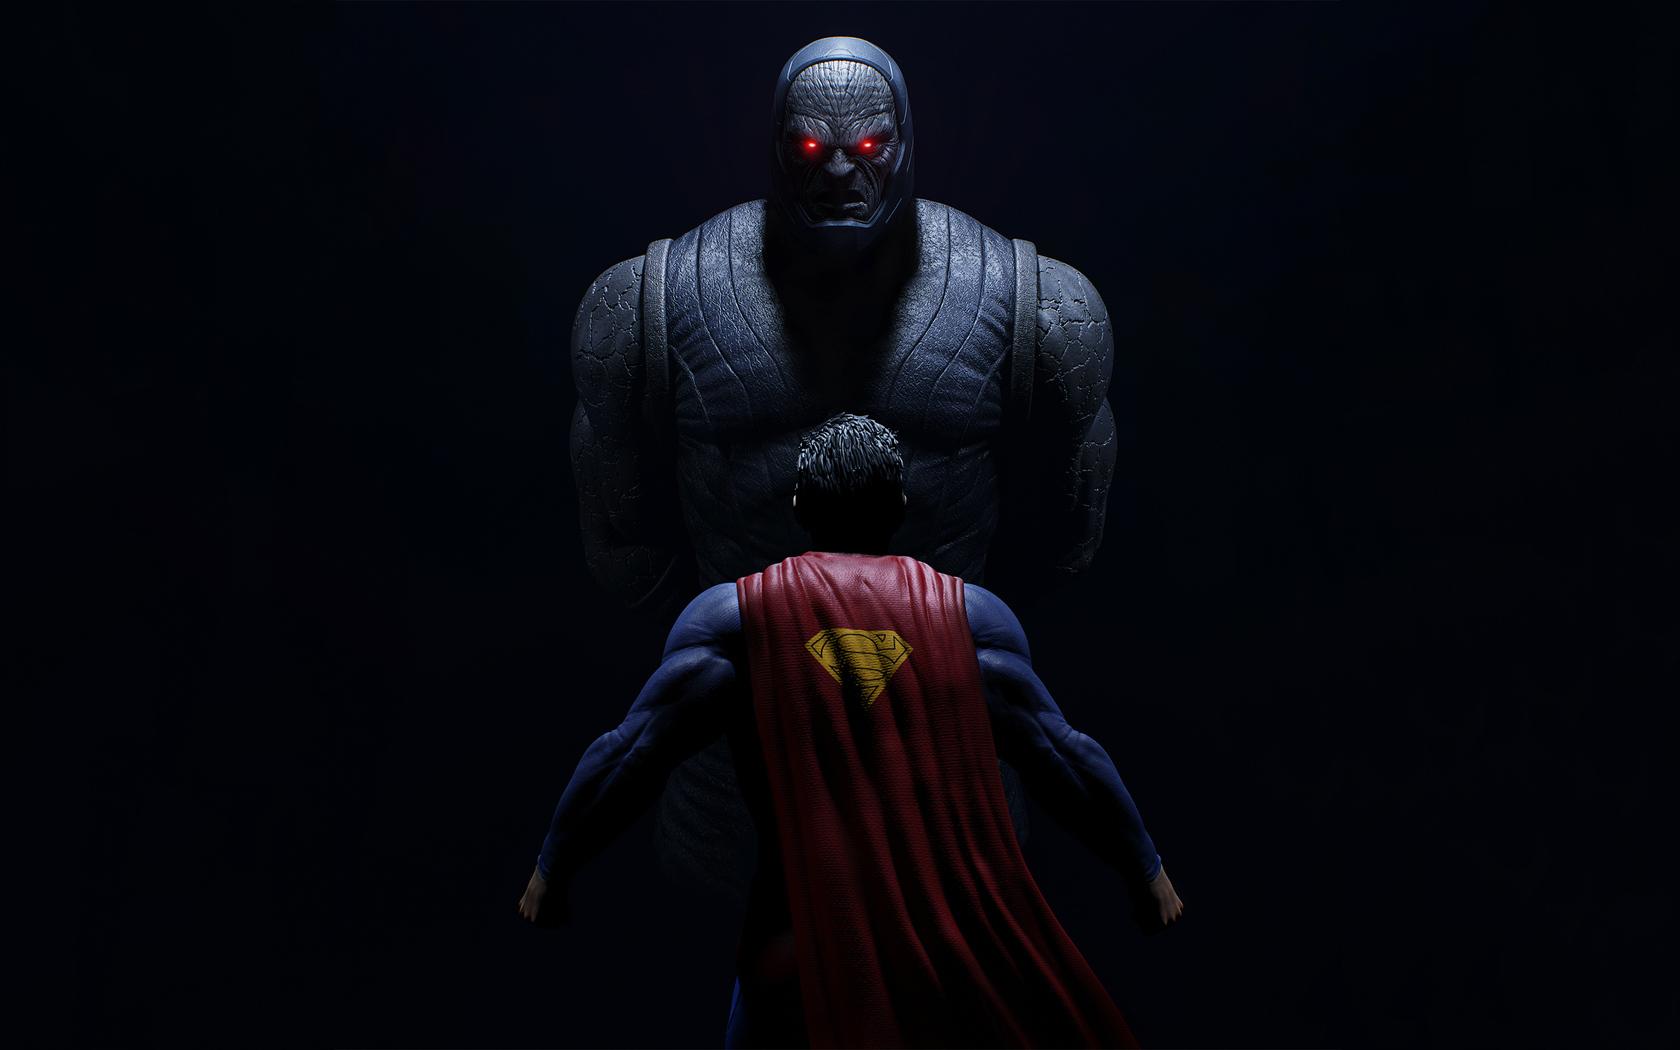 darkseid-vs-superman-ni.jpg